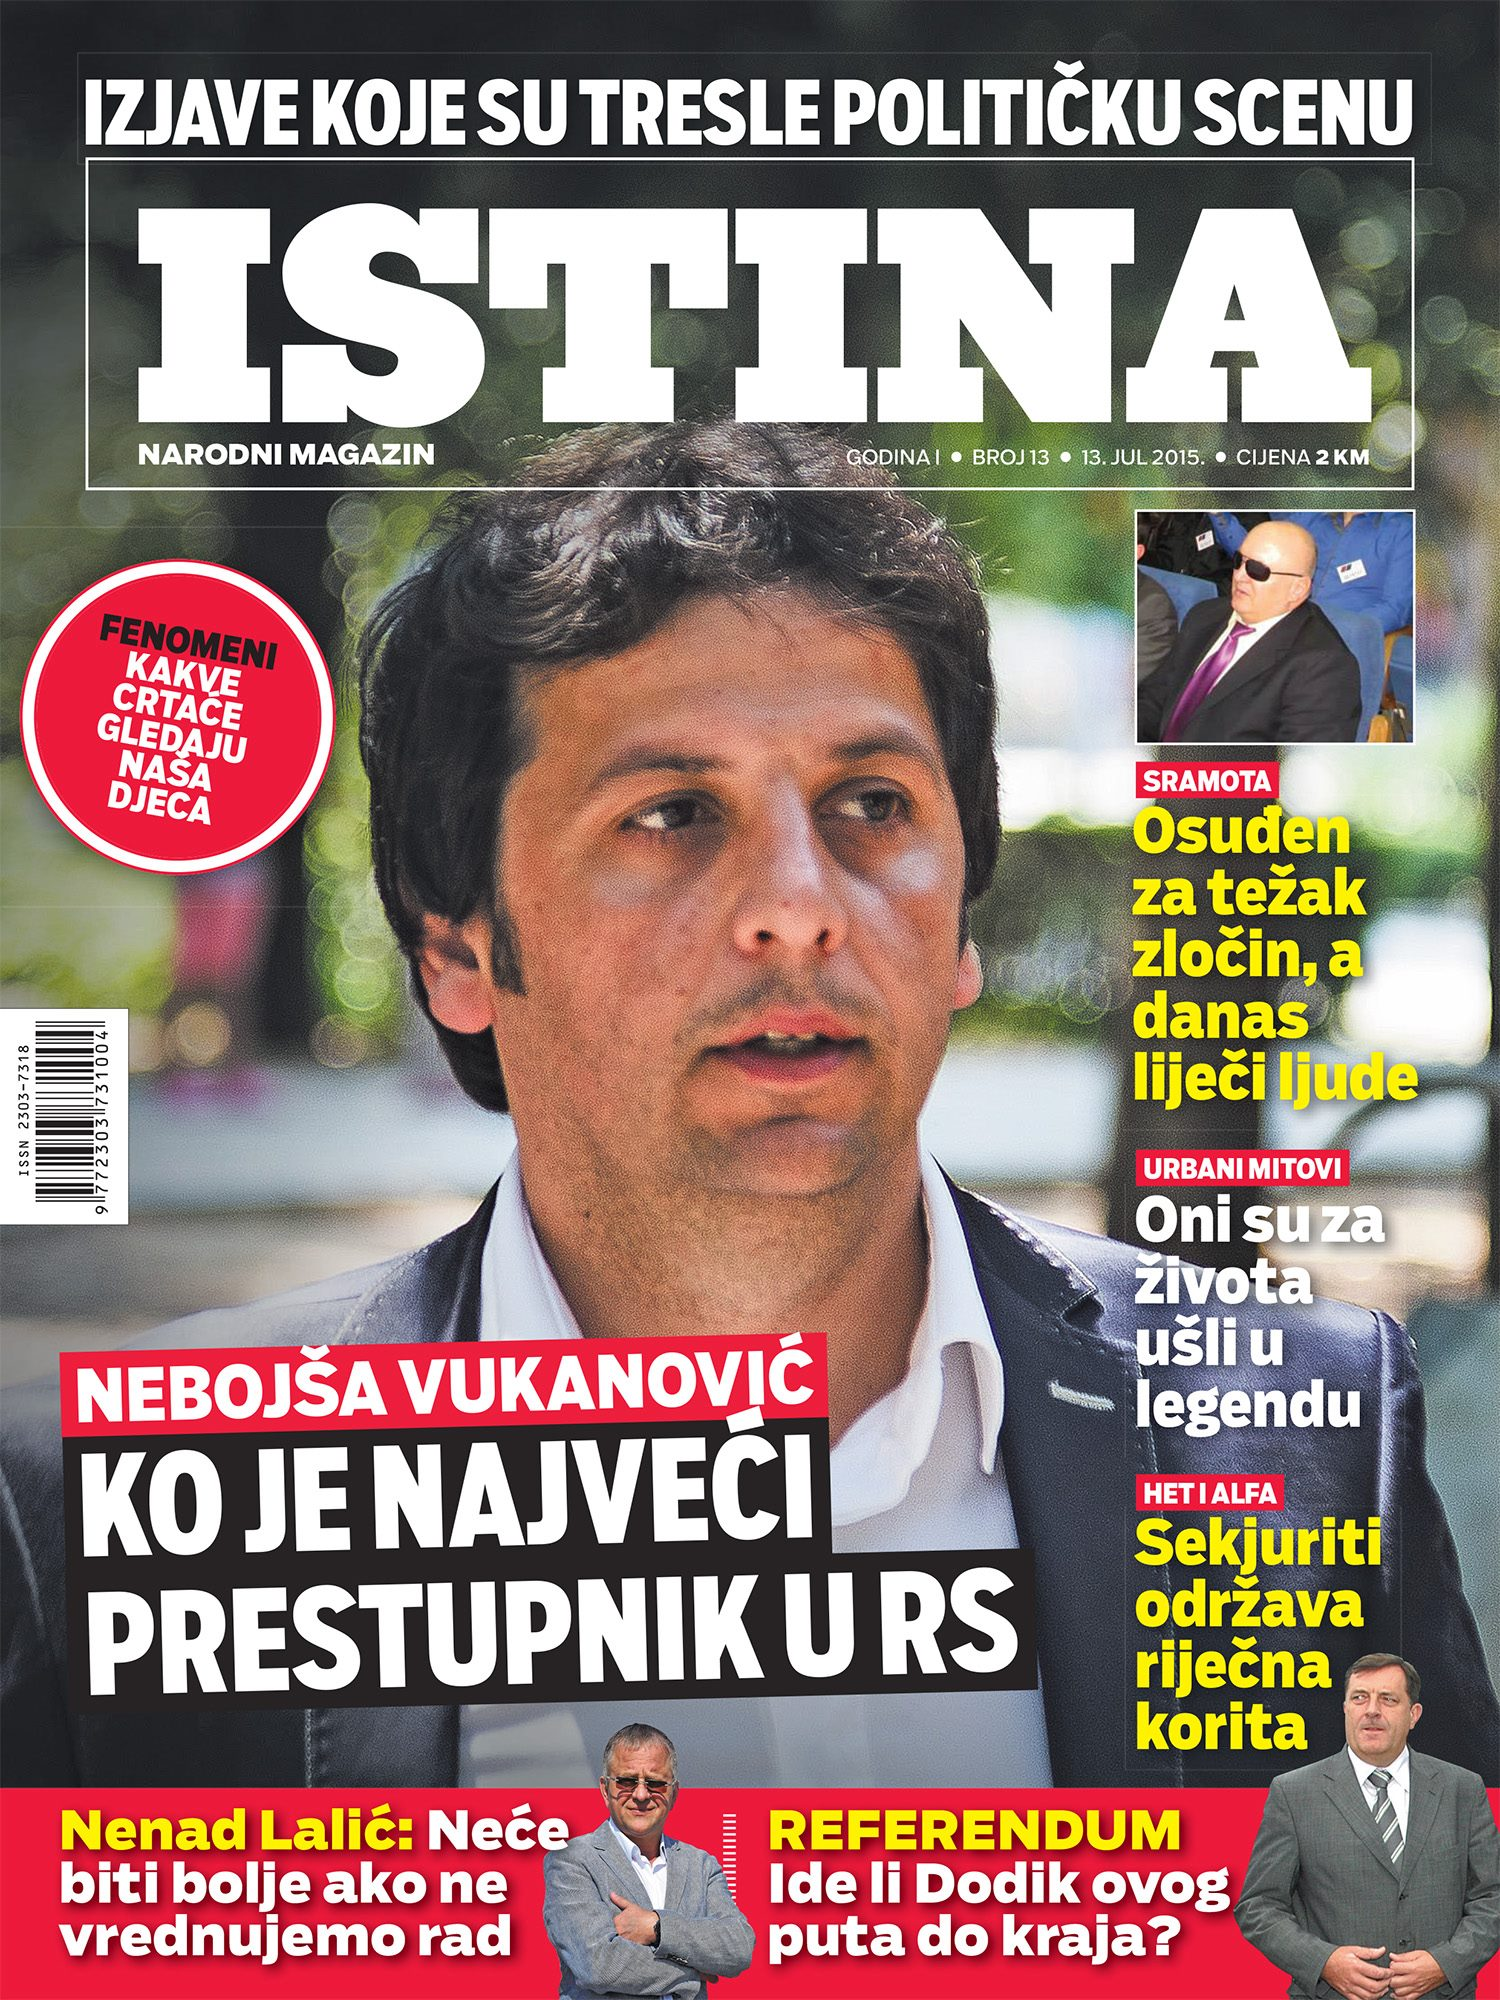 Nebojsa Vukanovic.jpg